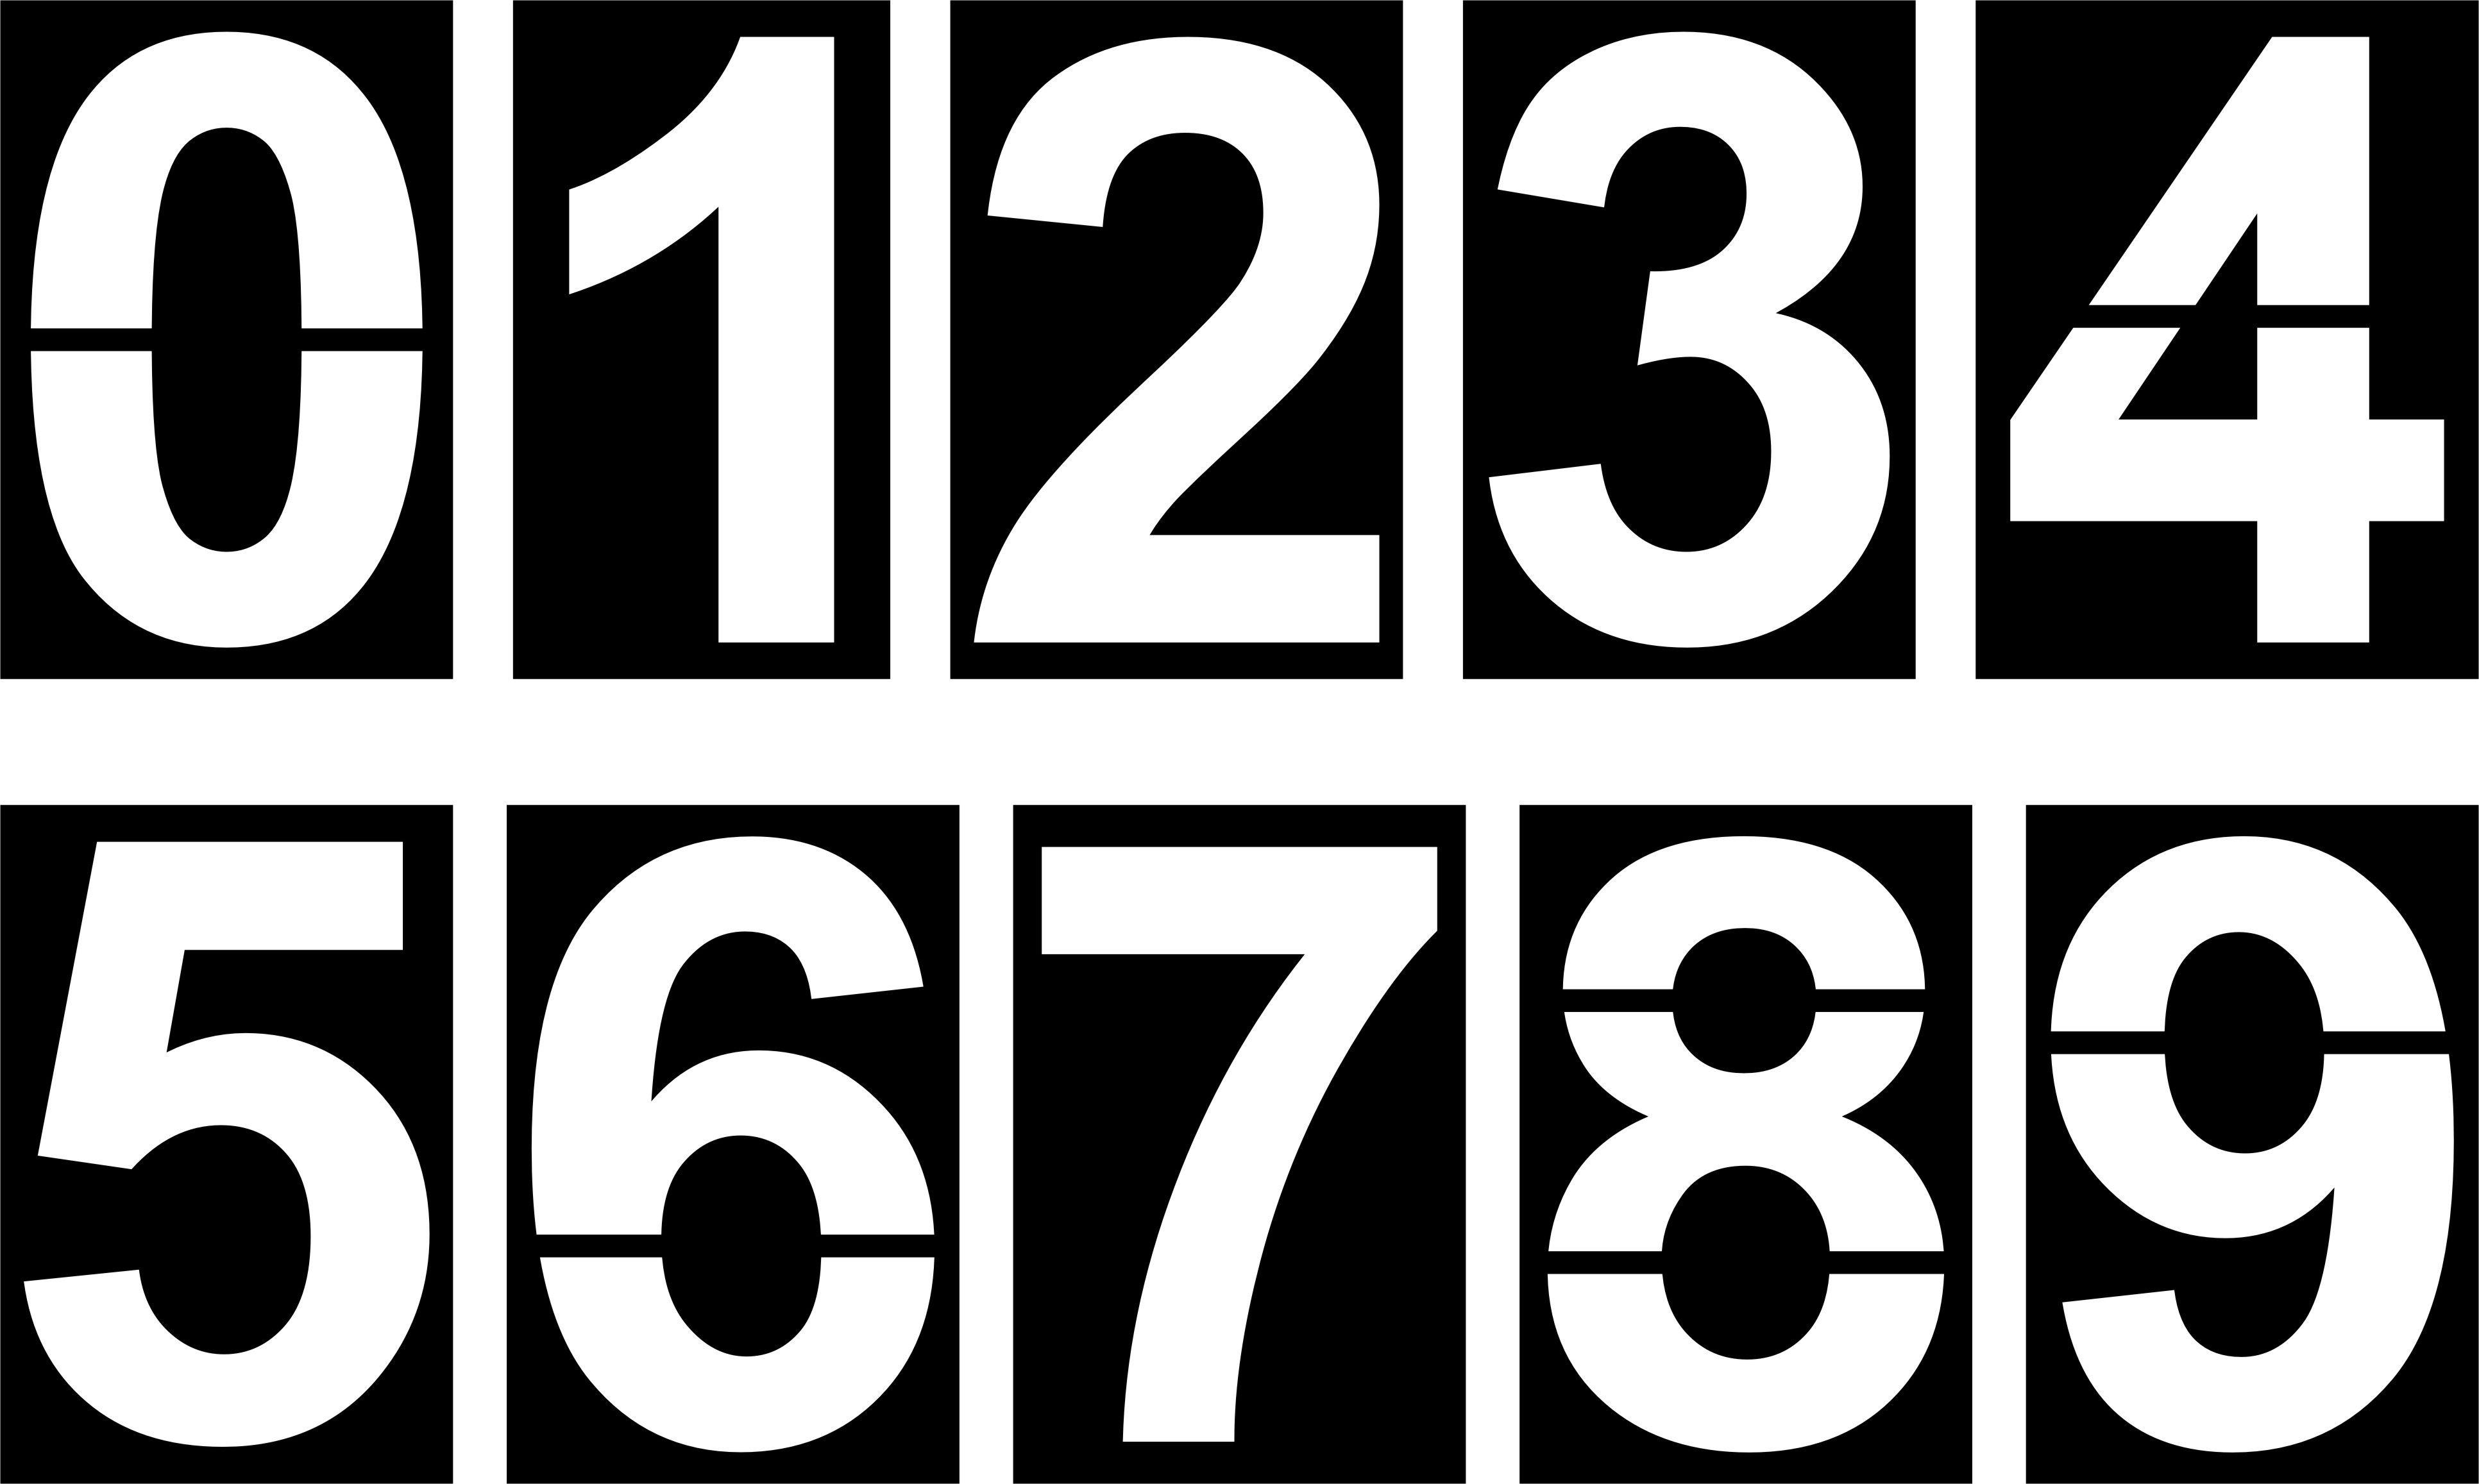 coloriage imprimer chiffres et formes chiffre deux. Black Bedroom Furniture Sets. Home Design Ideas